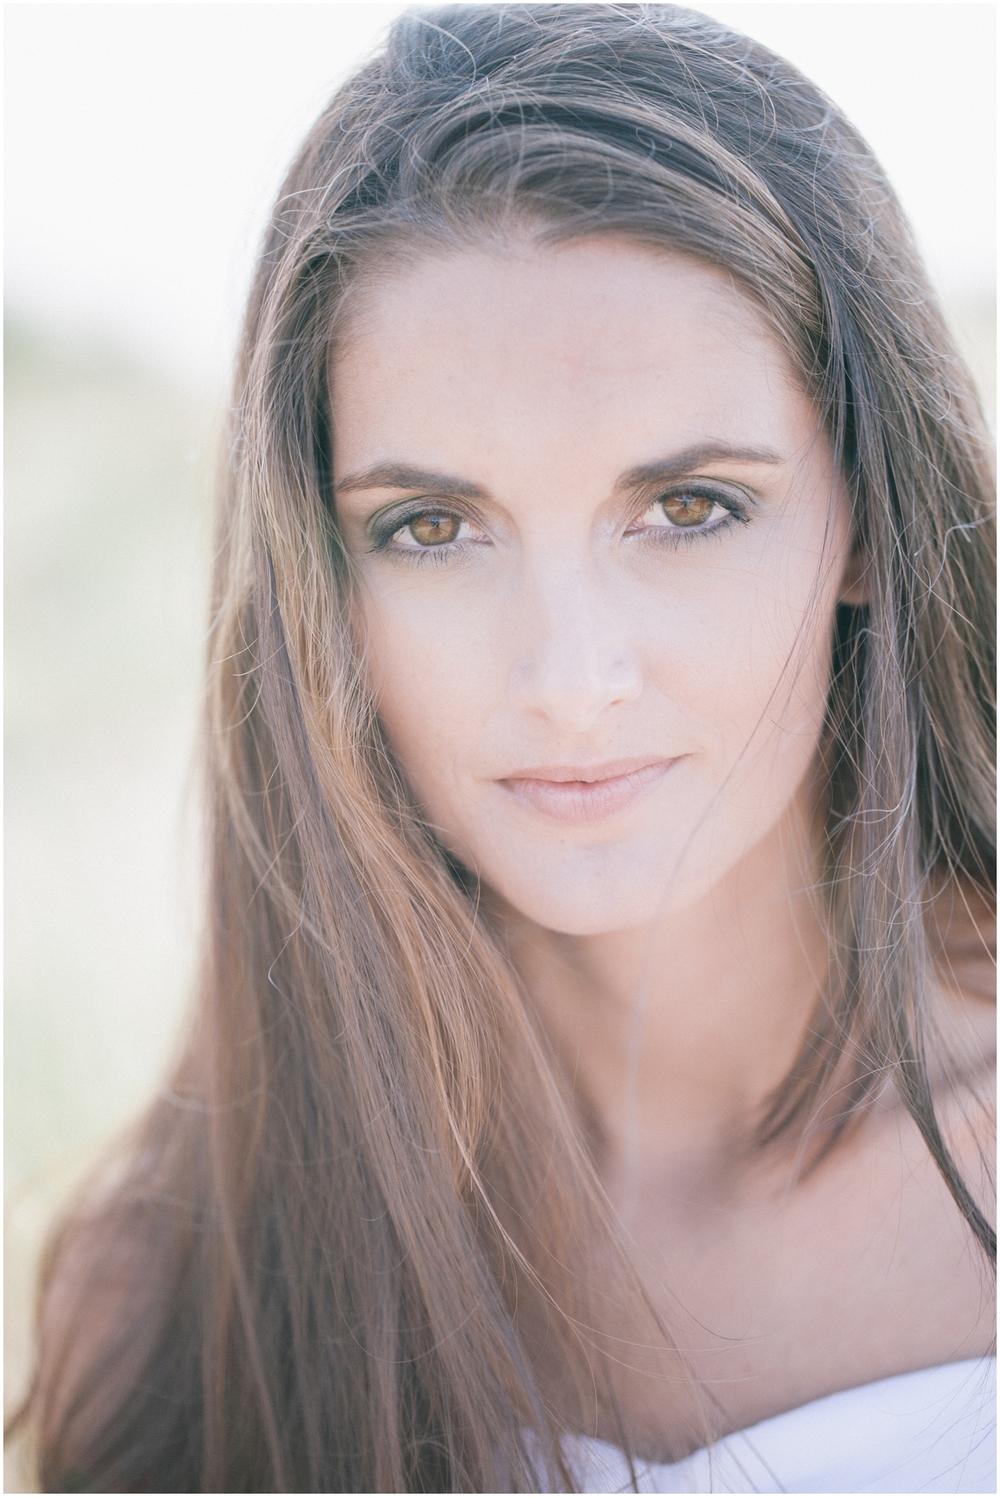 Model Nikki Keulemans